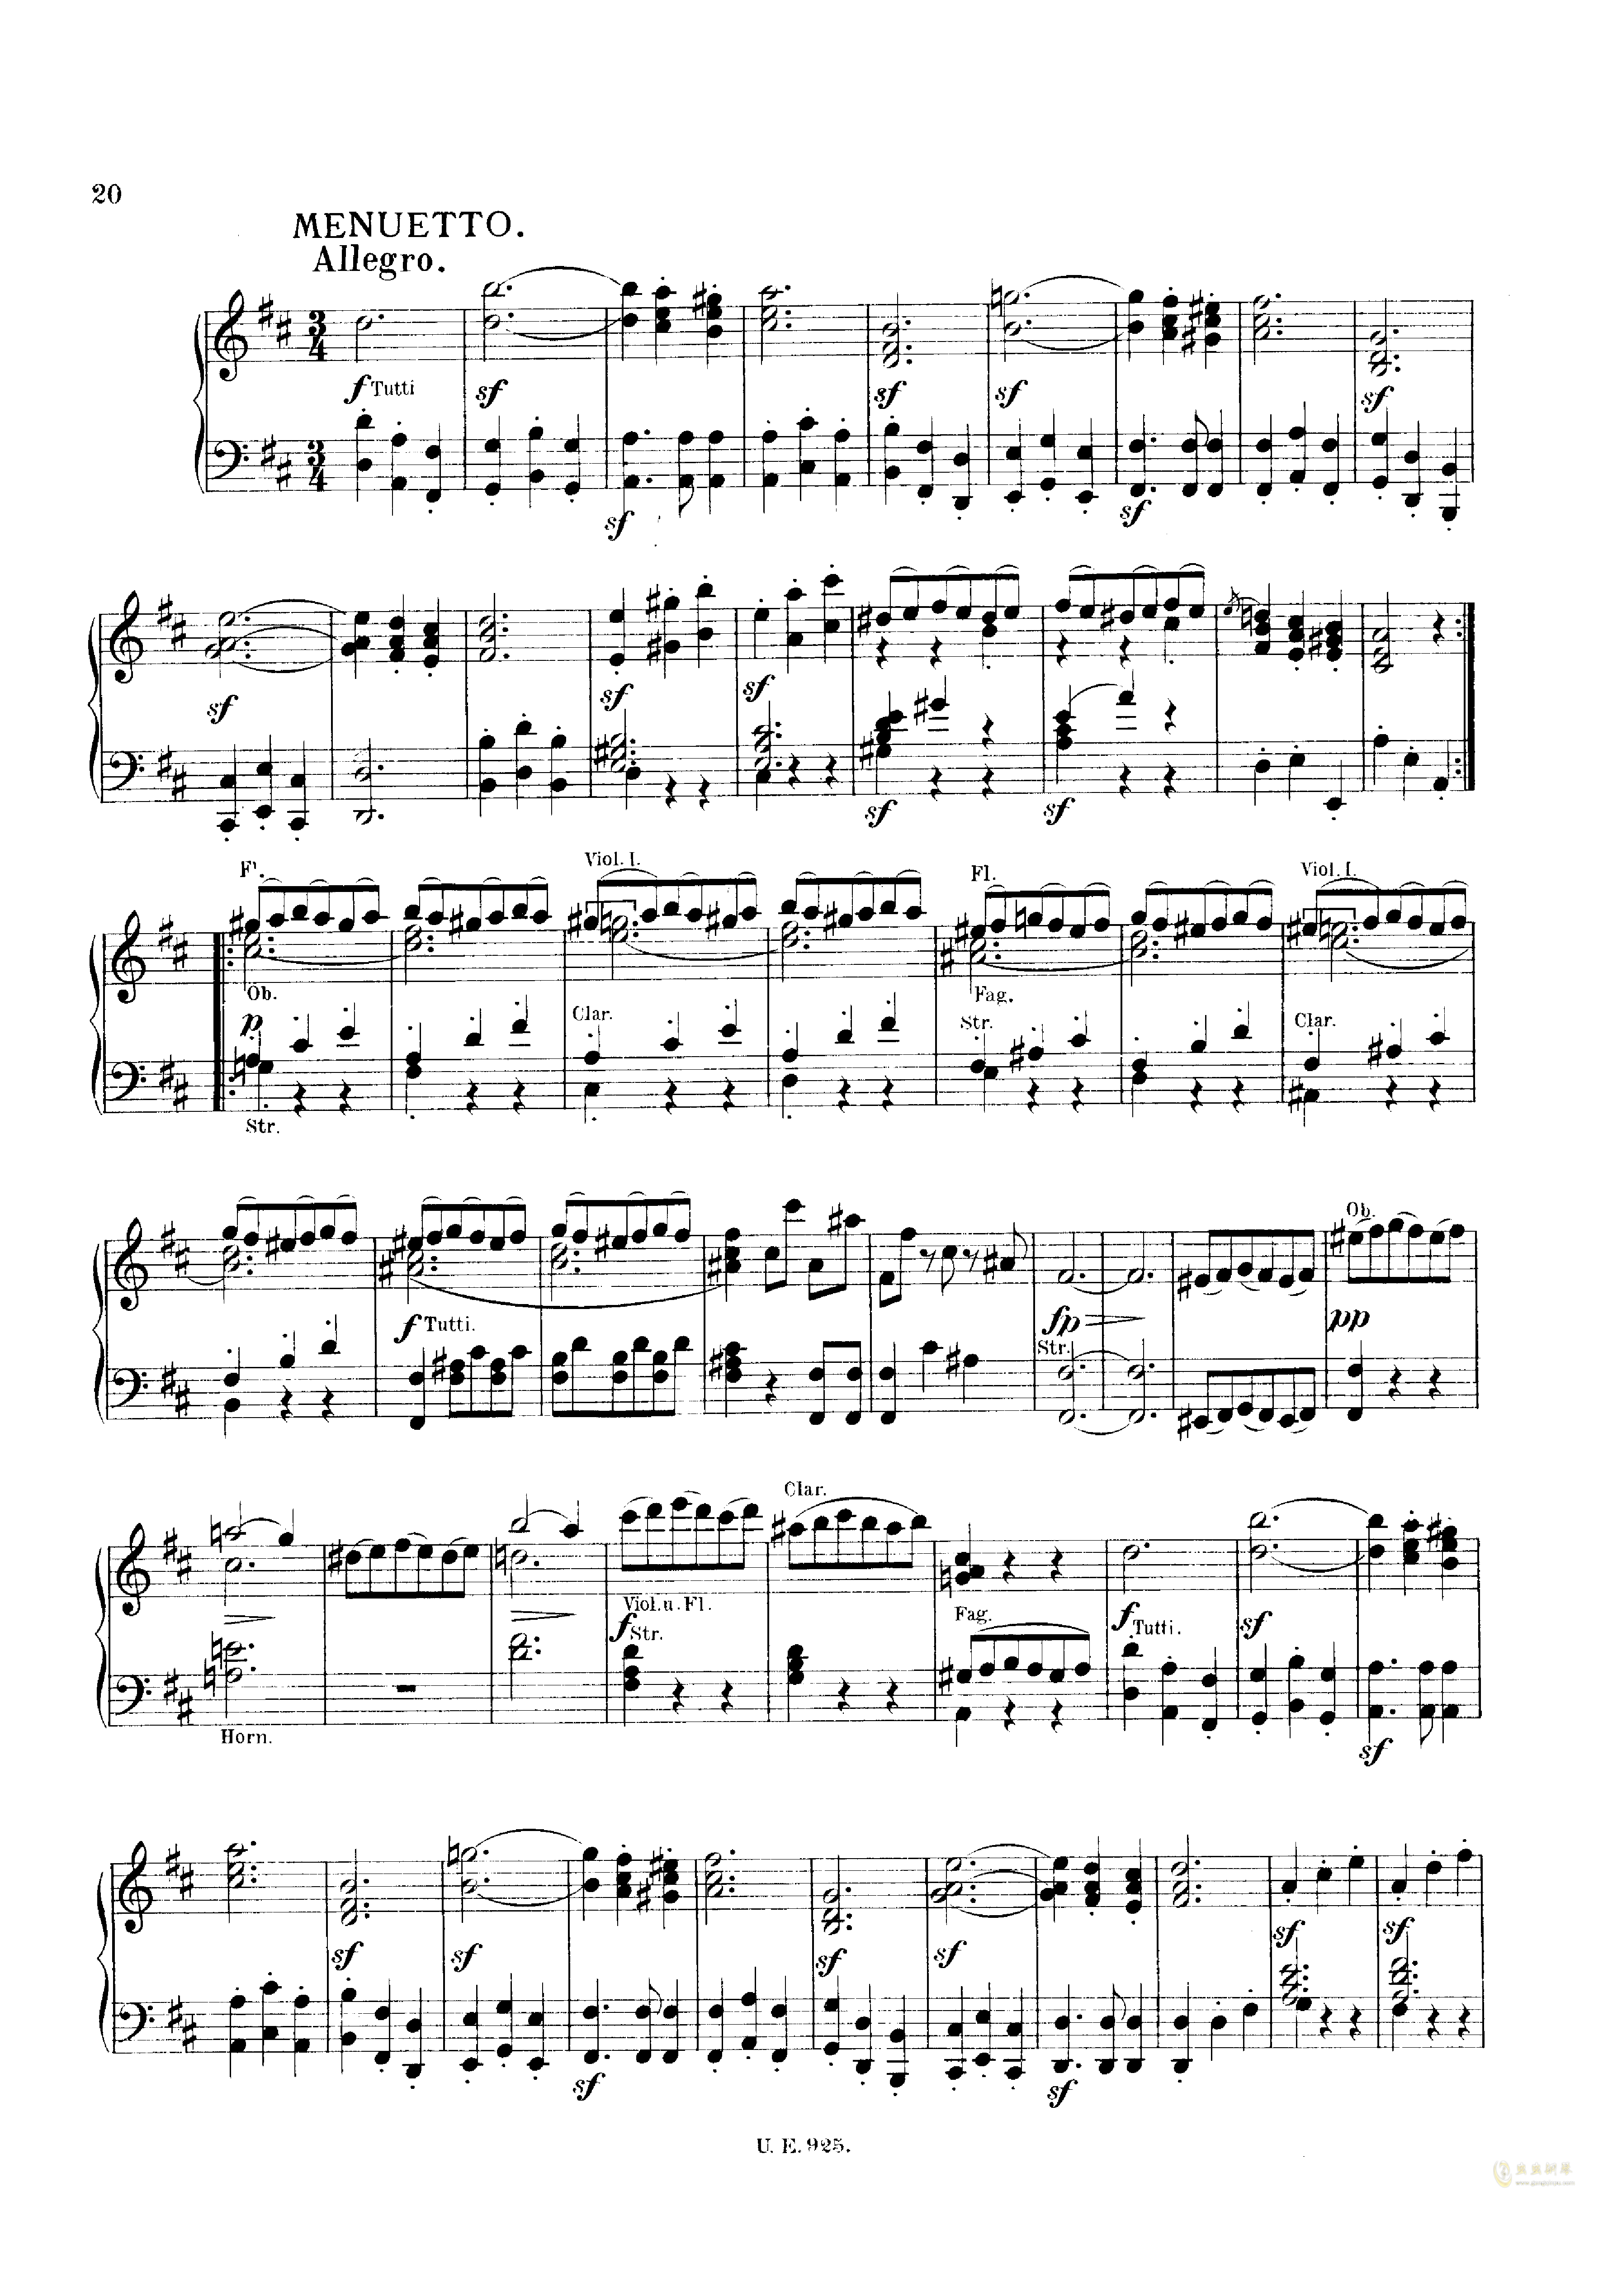 D大调第一交响曲钢琴谱 第20页